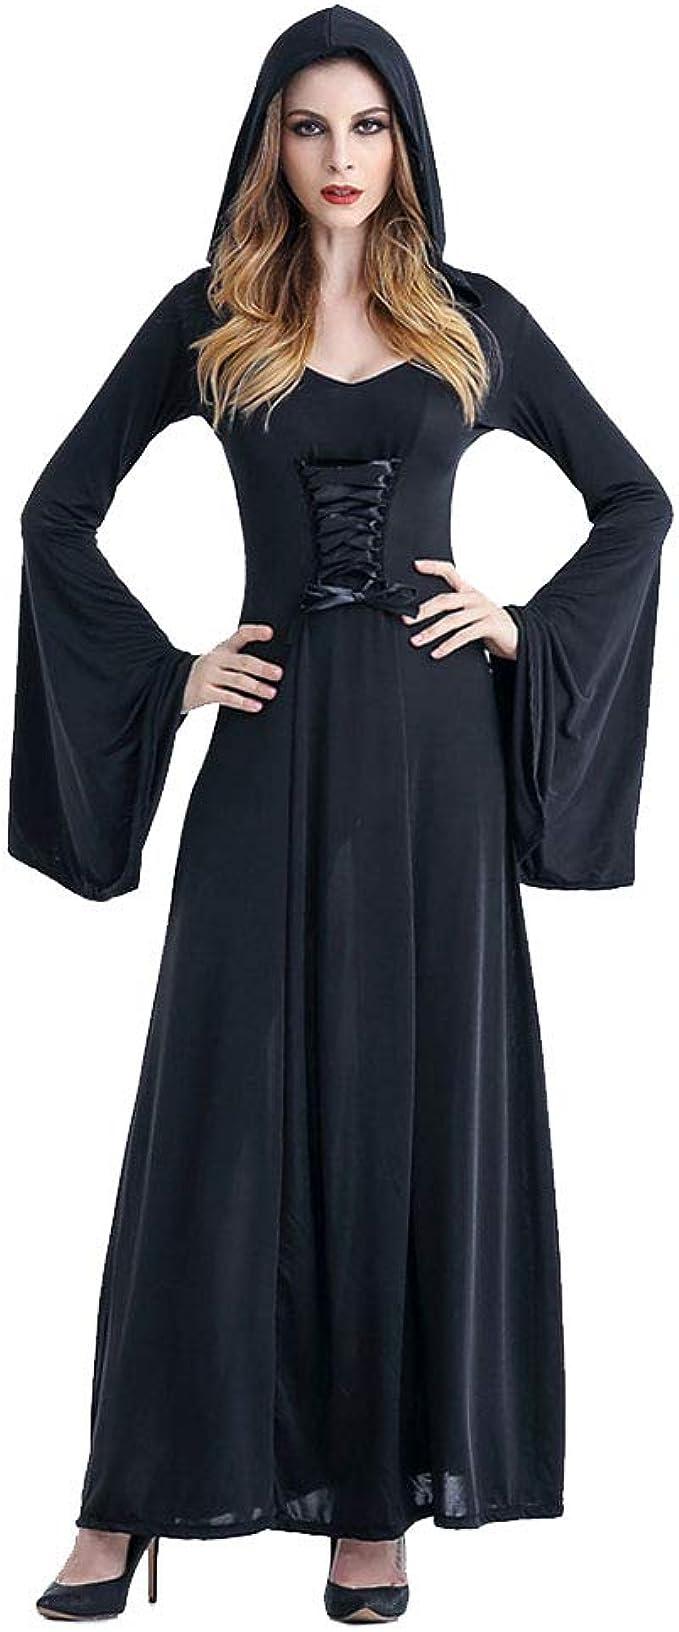 HOOLAZA Schwarze Frauen Rollenspiele Vampire Hexe Dämon Kostüm